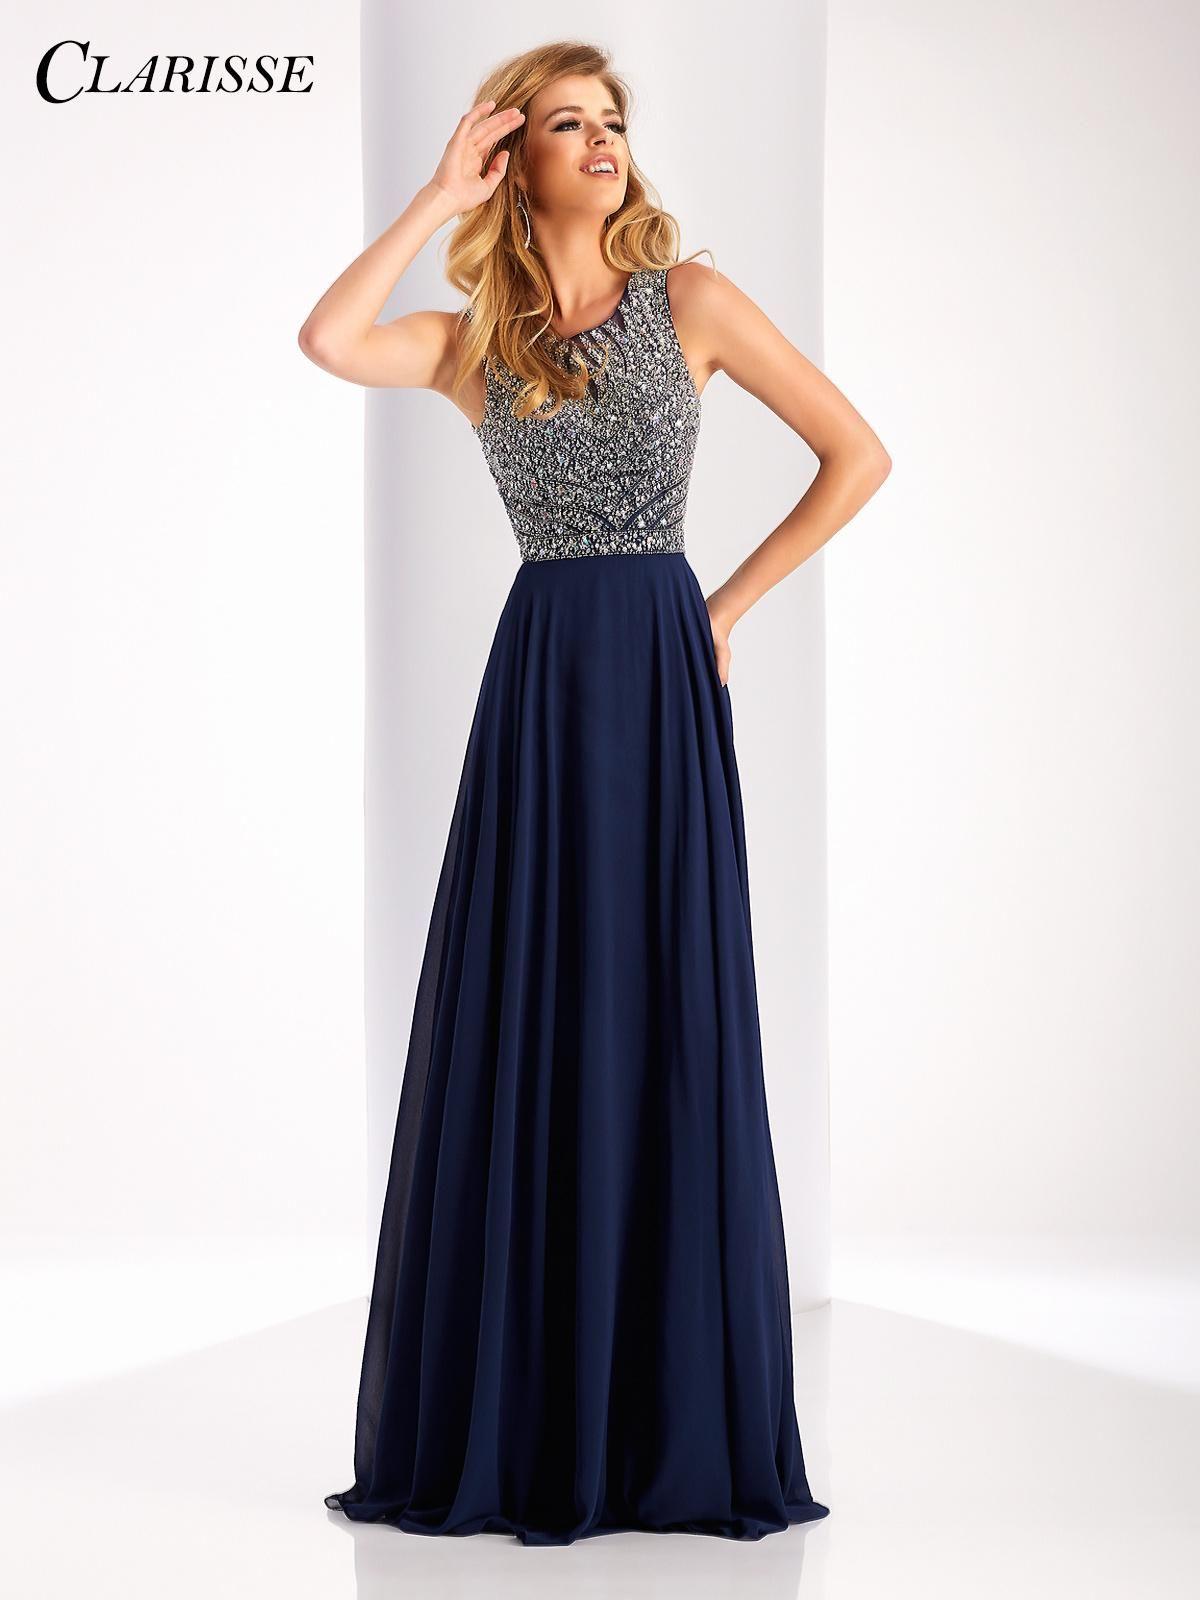 Clarisse Sparkly Flowy Prom Dress Style 3167 Twirl the night away in this flowy chiffon prom